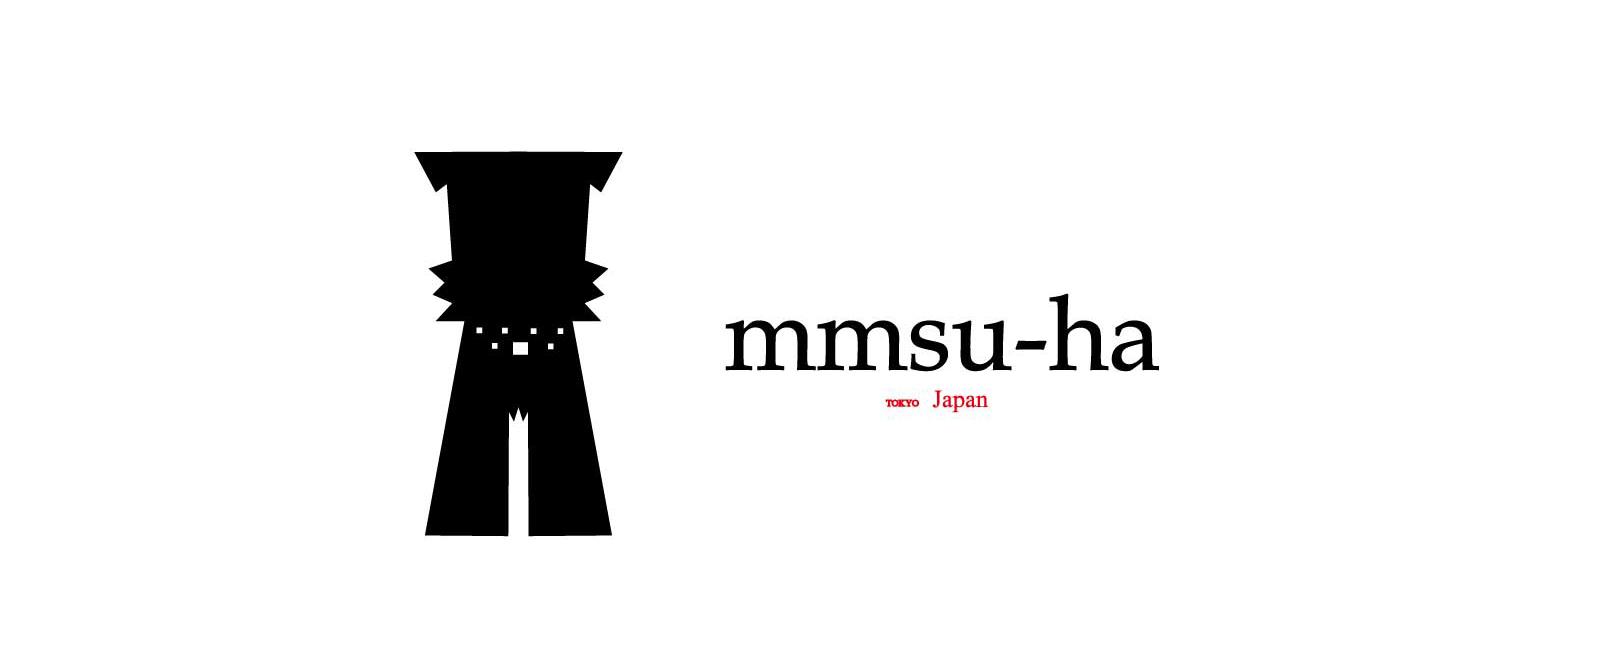 mmsu-ha全メニュー